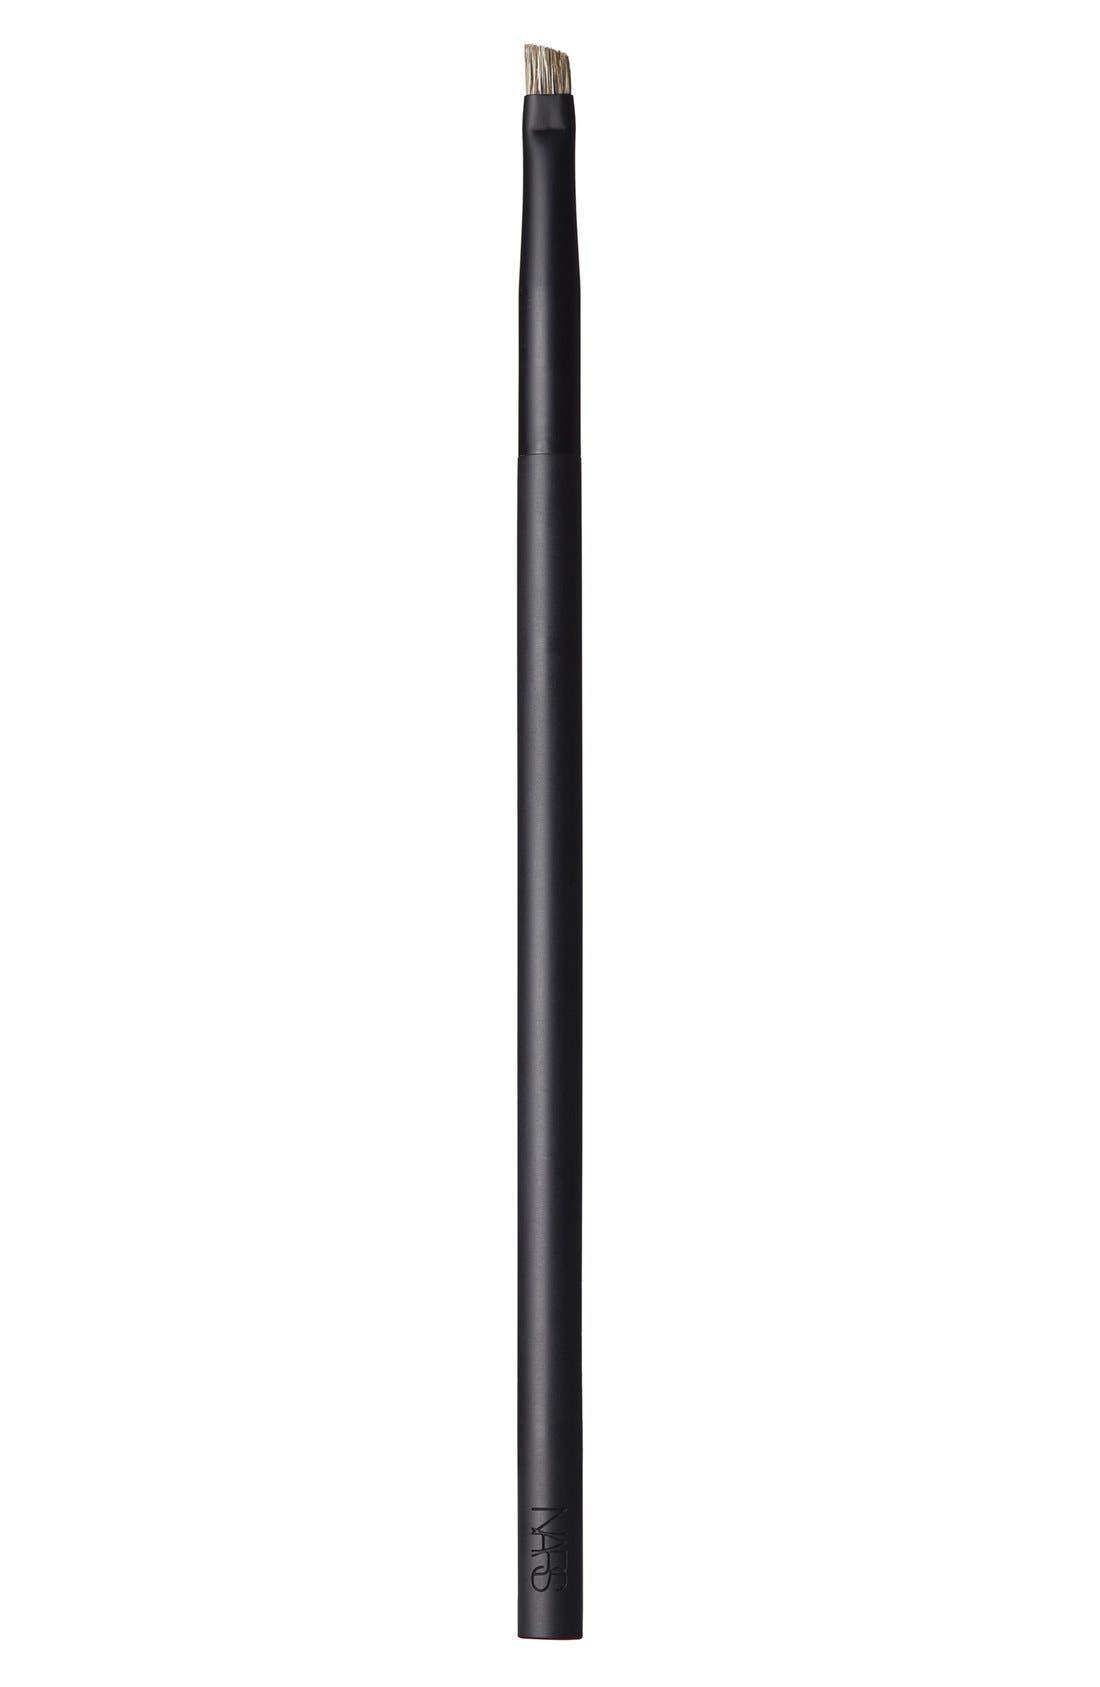 NARS #48 Brow Defining Brush